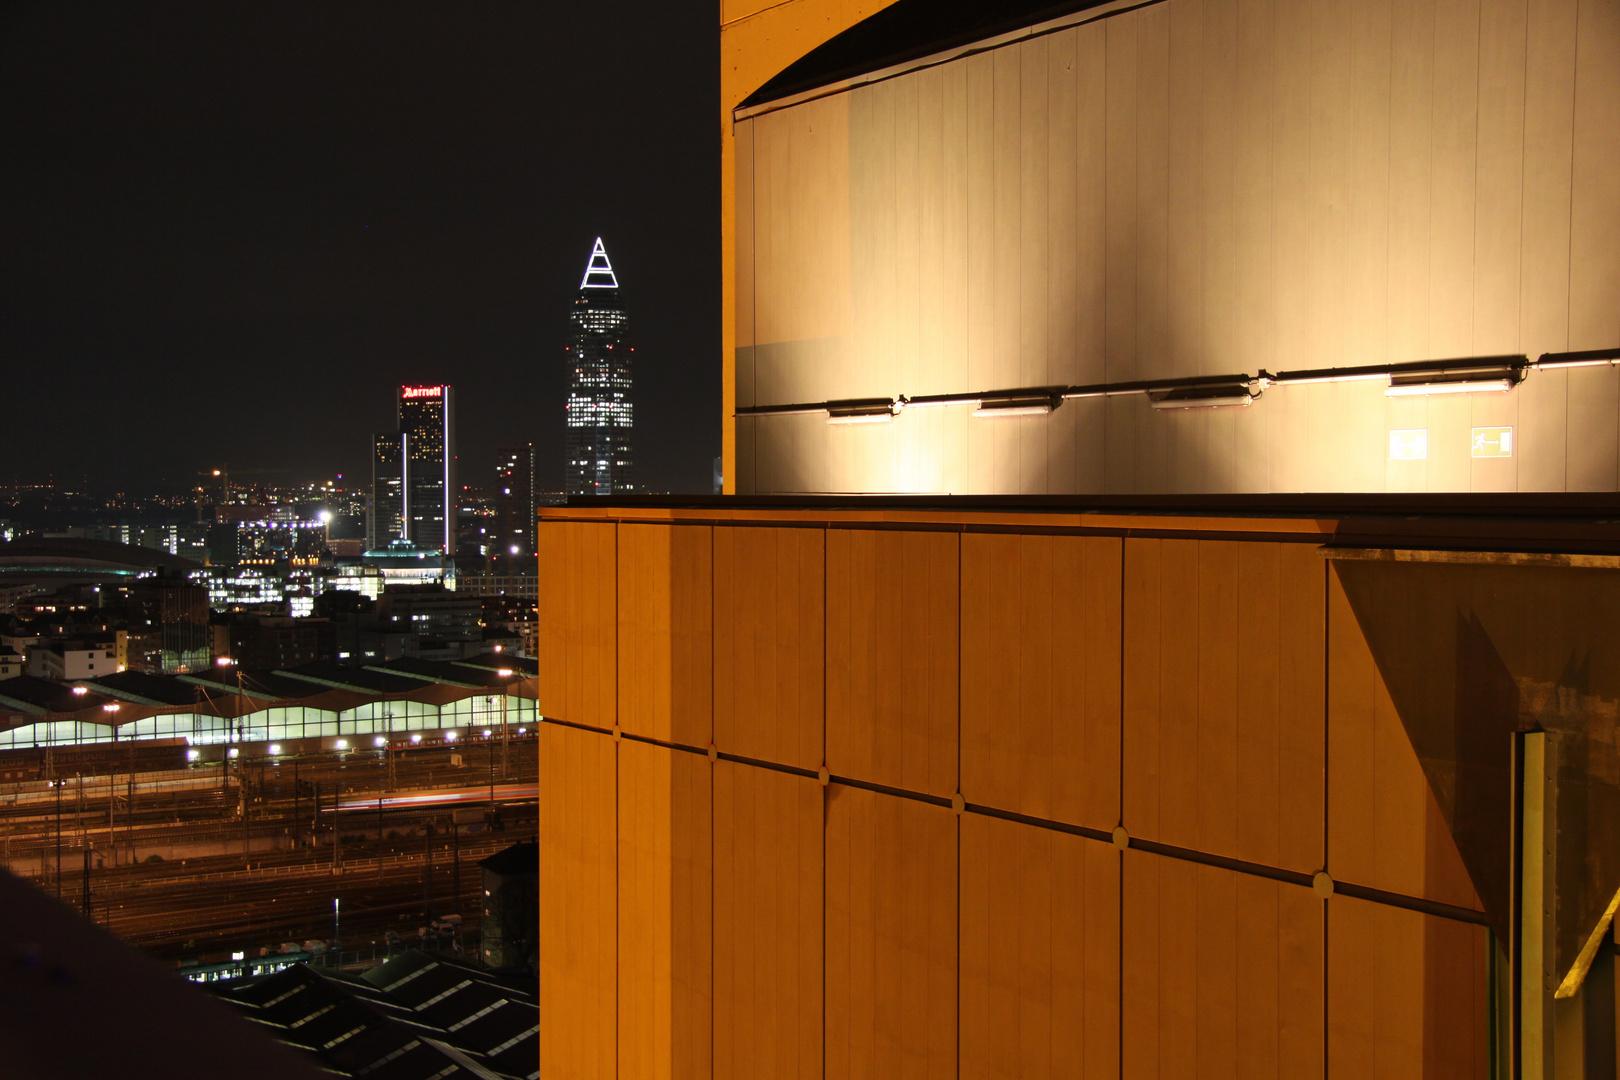 Dachbeleuchtung des HKW West....